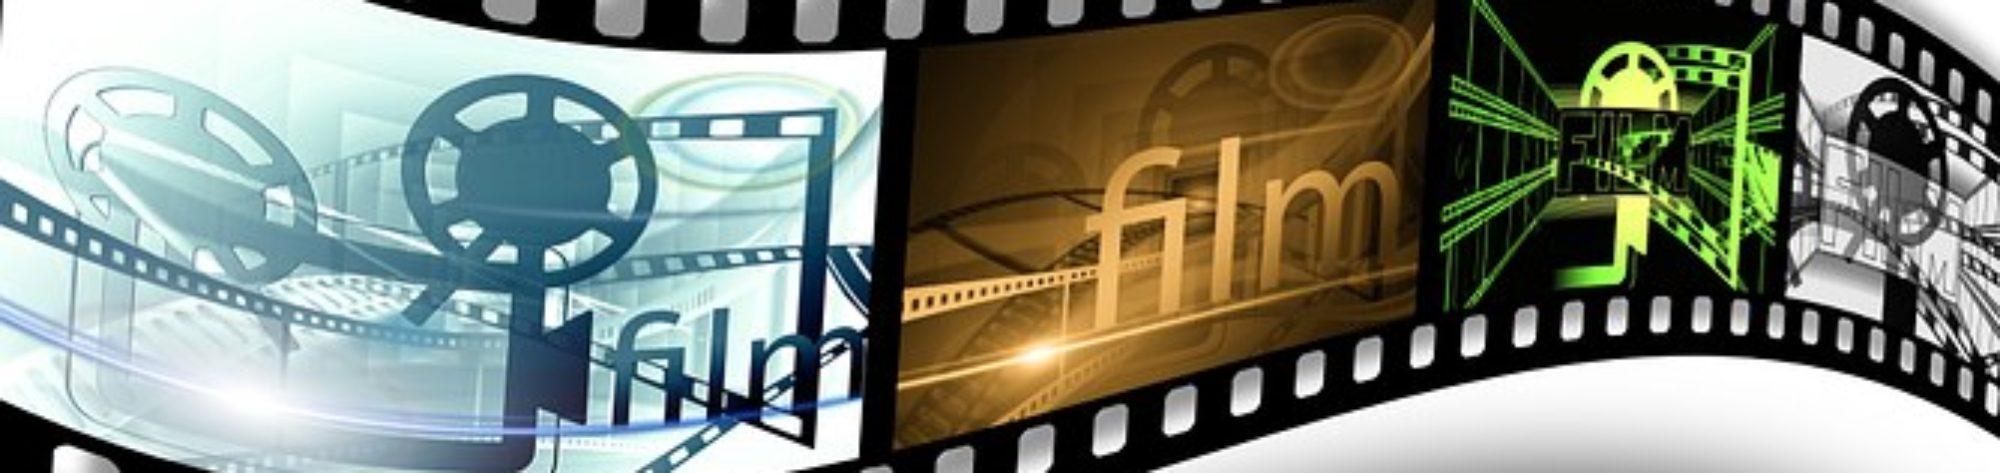 Videofilmstem